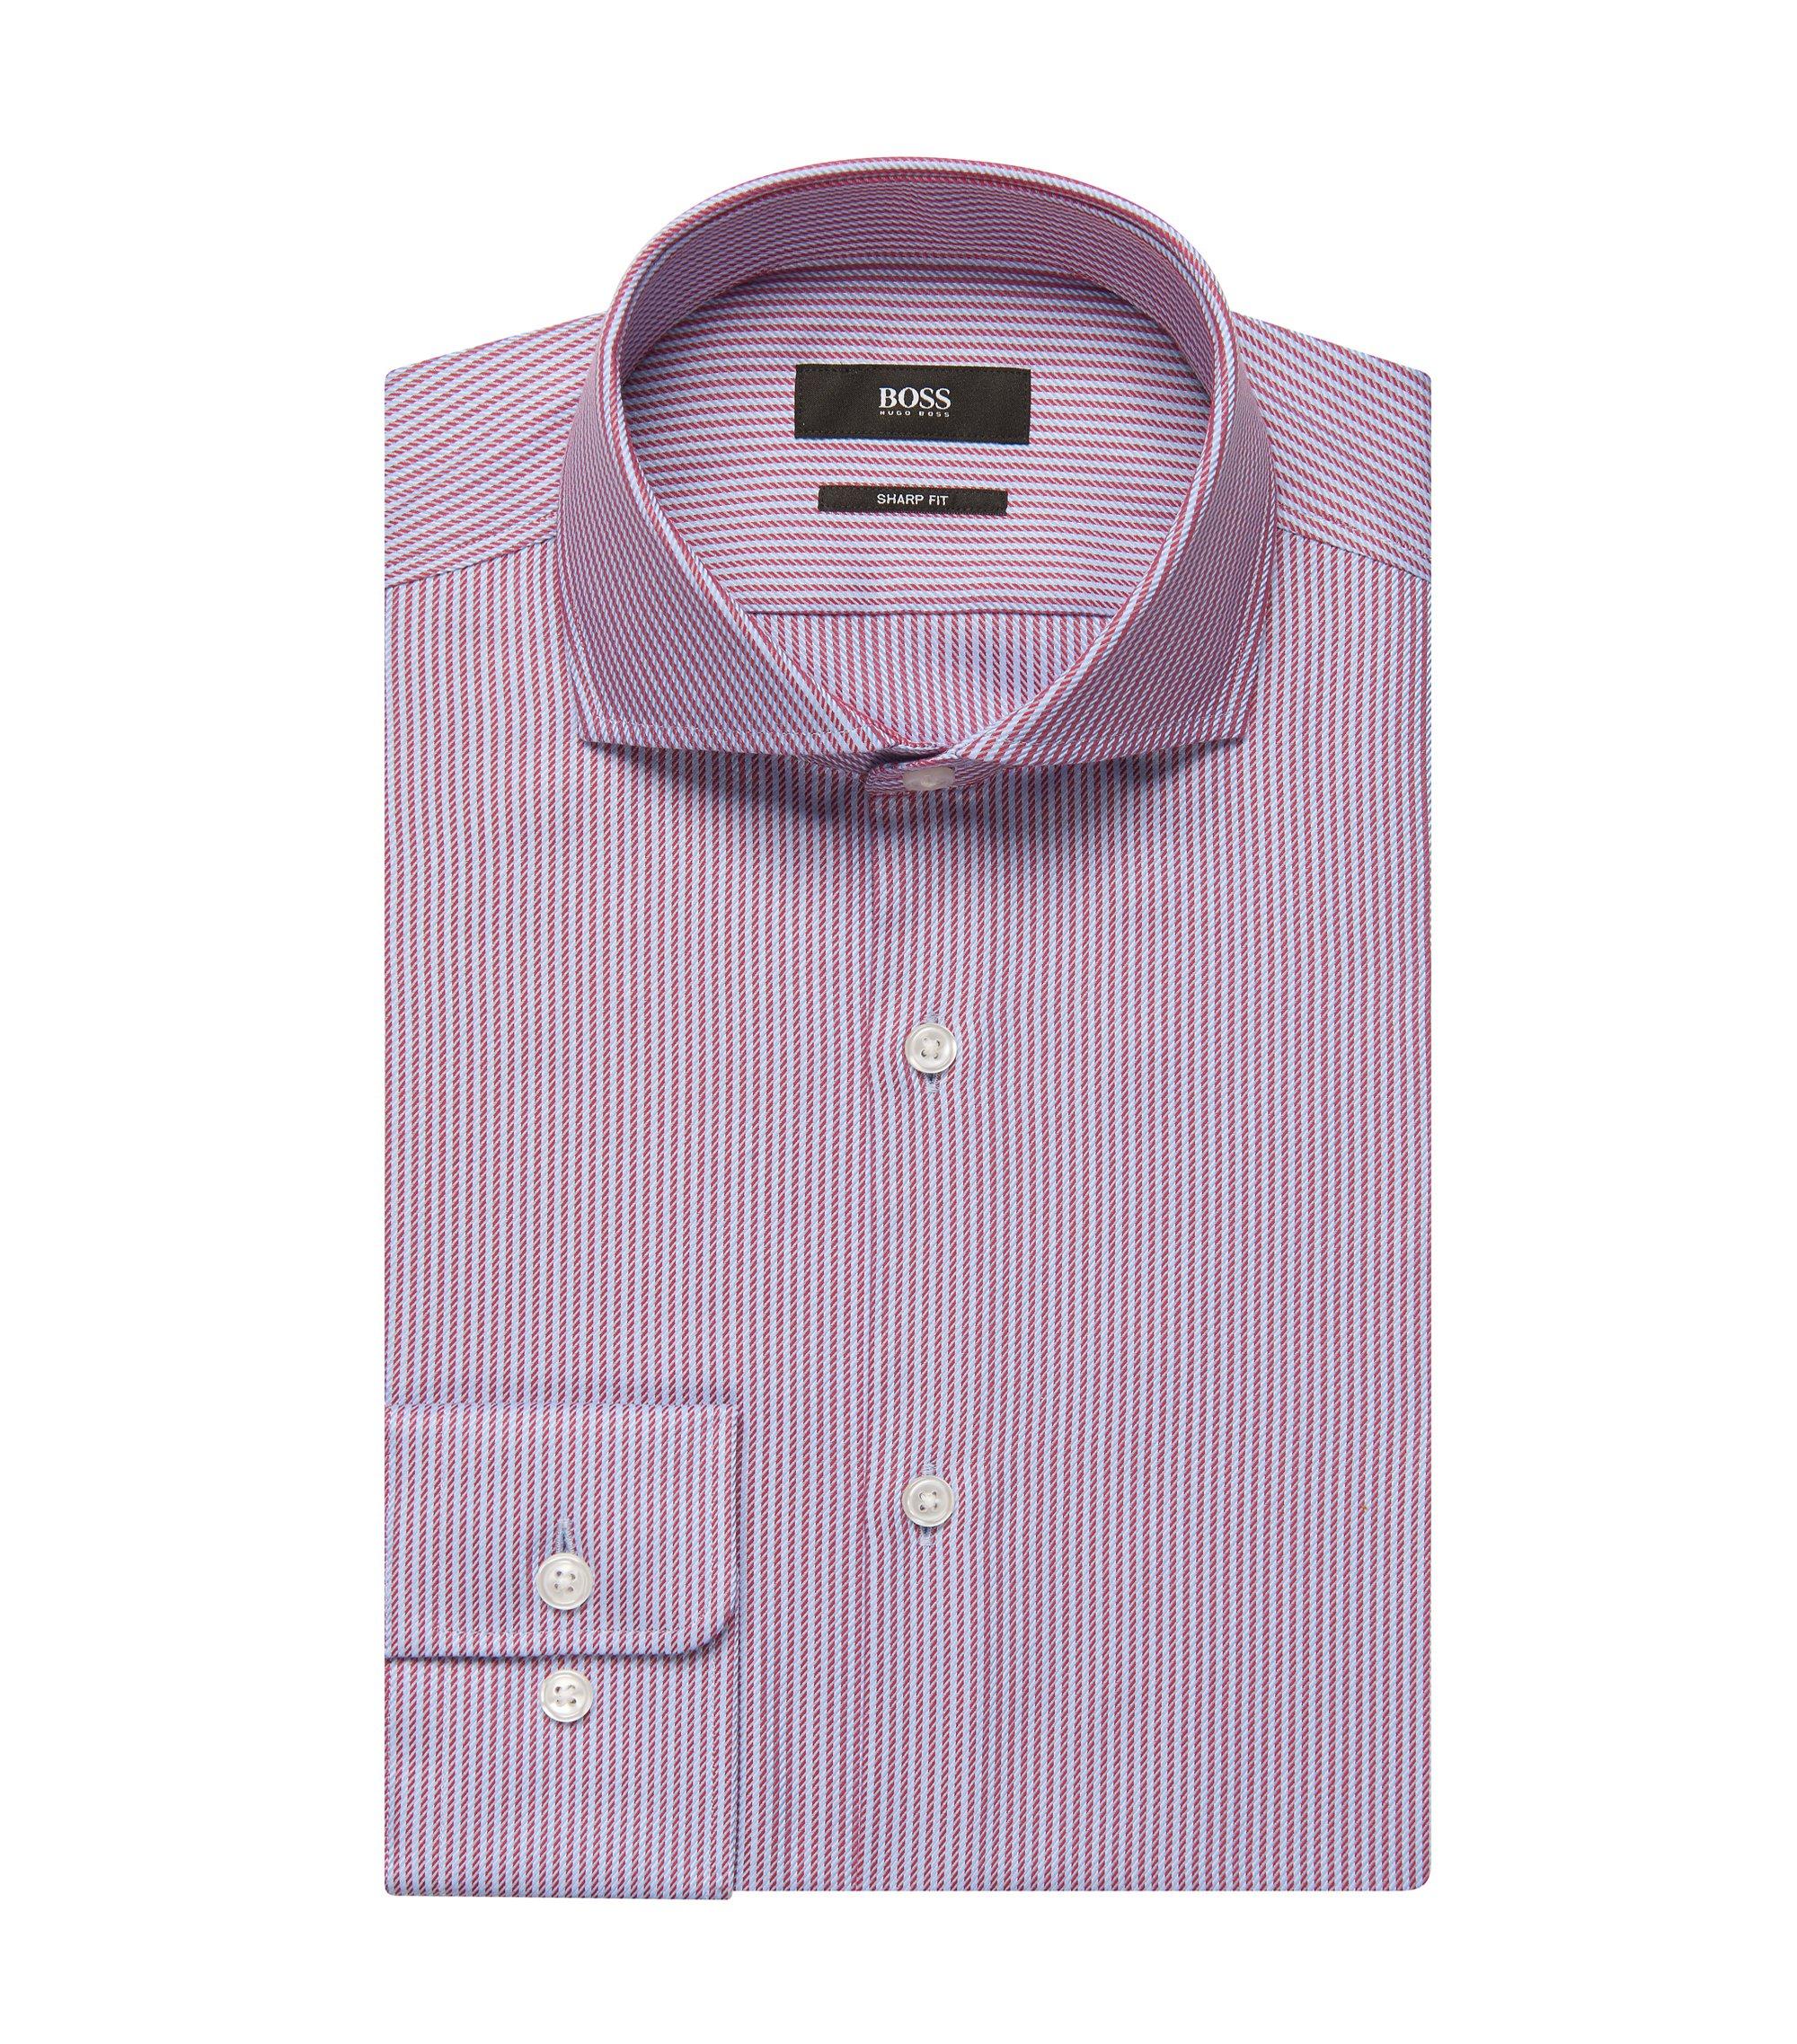 Striped Cotton Dress Shirt, Sharp Fit | Mark US, Red